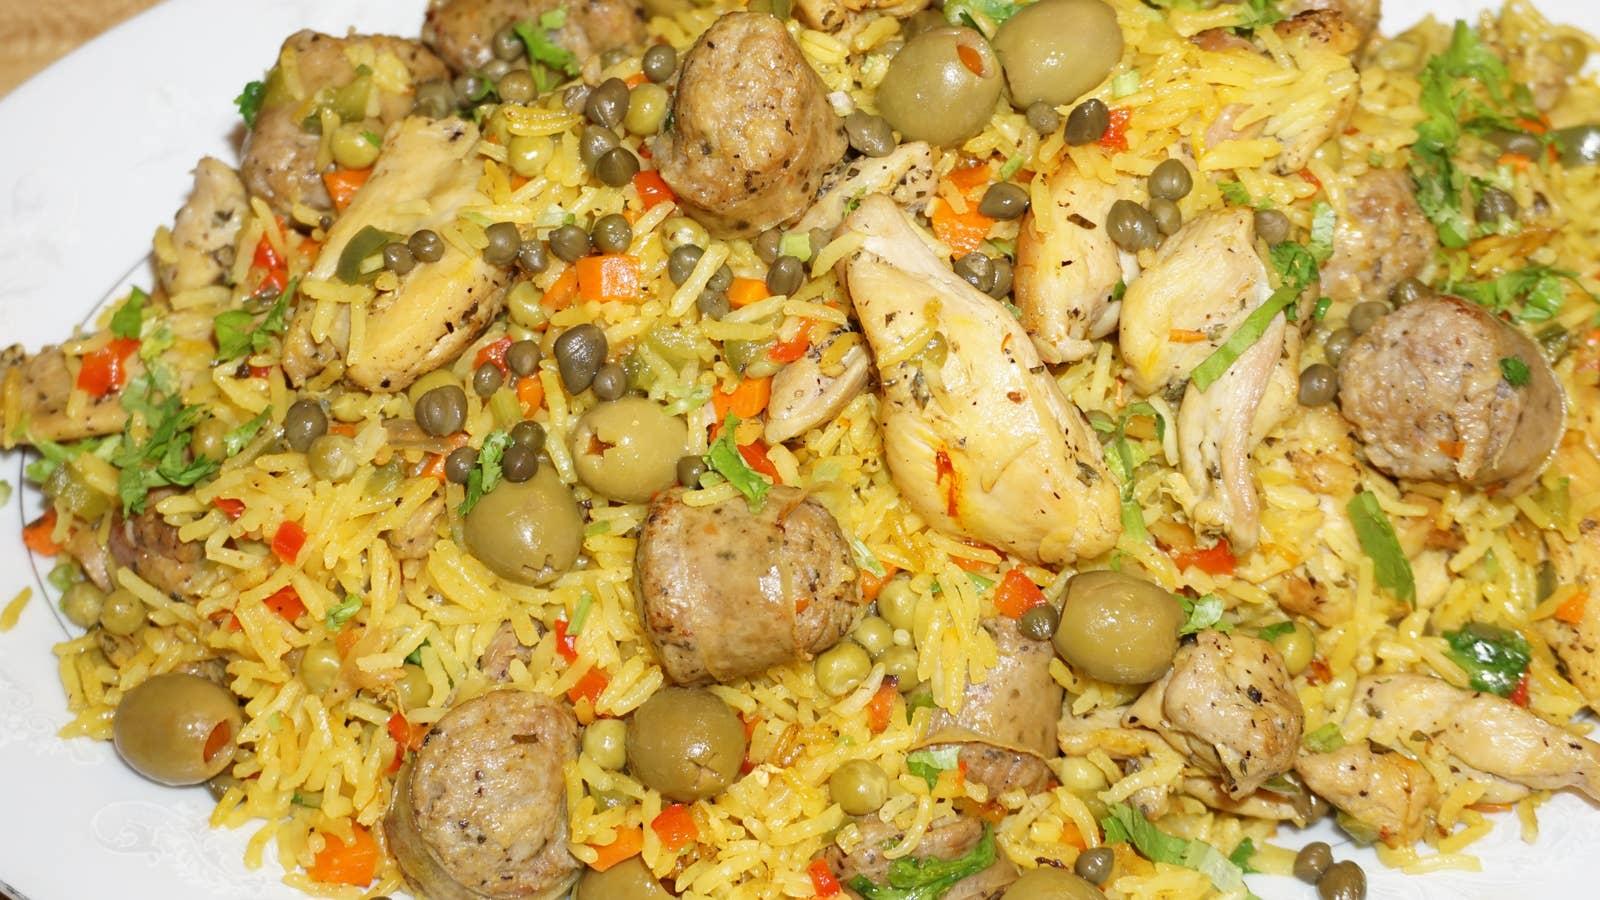 Arroz Con Pollo (Rice With Chicken)